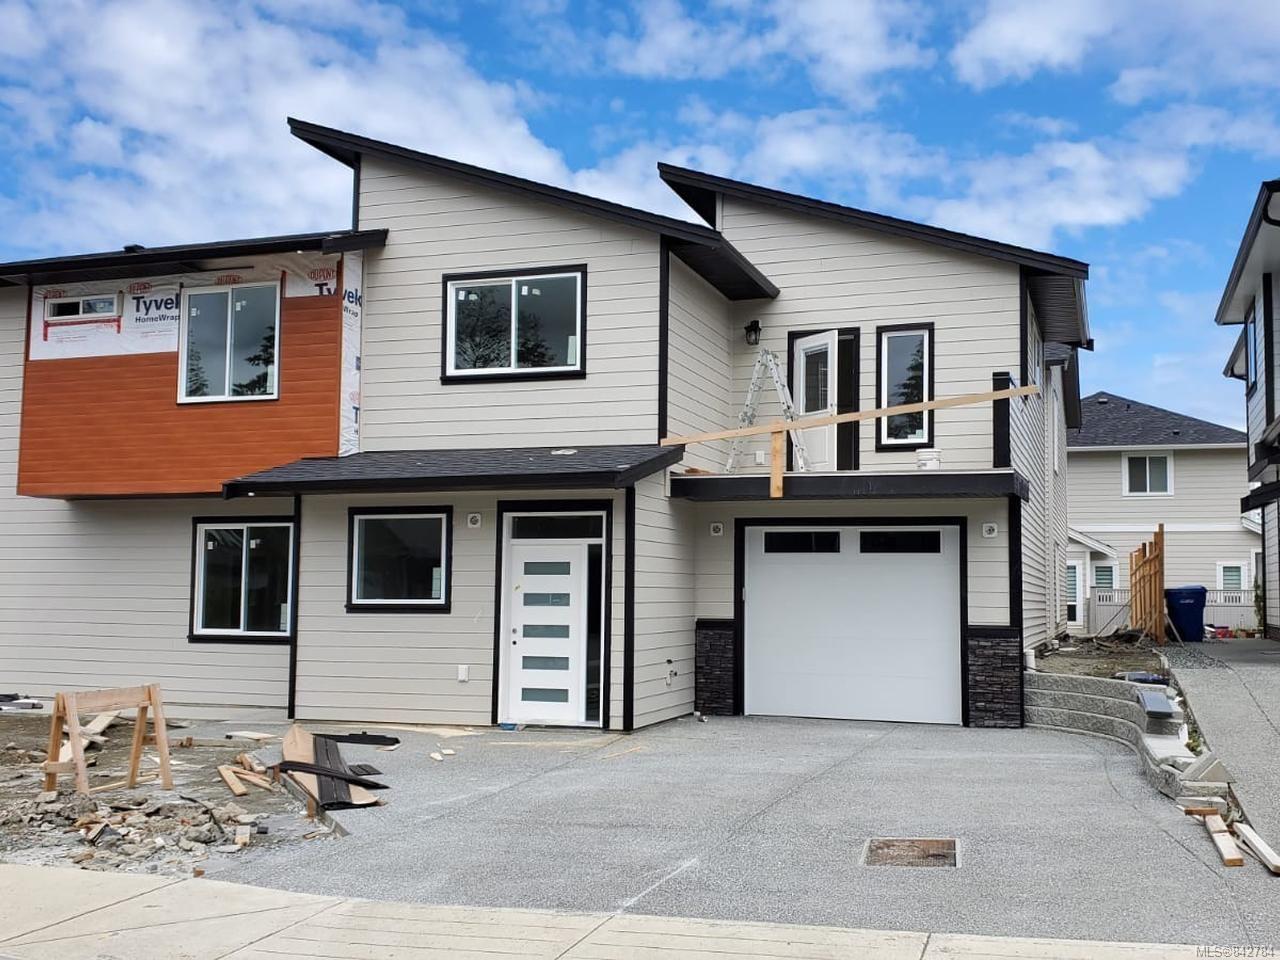 Main Photo: 152 Lindquist Rd in NANAIMO: Na North Nanaimo Half Duplex for sale (Nanaimo)  : MLS®# 842784